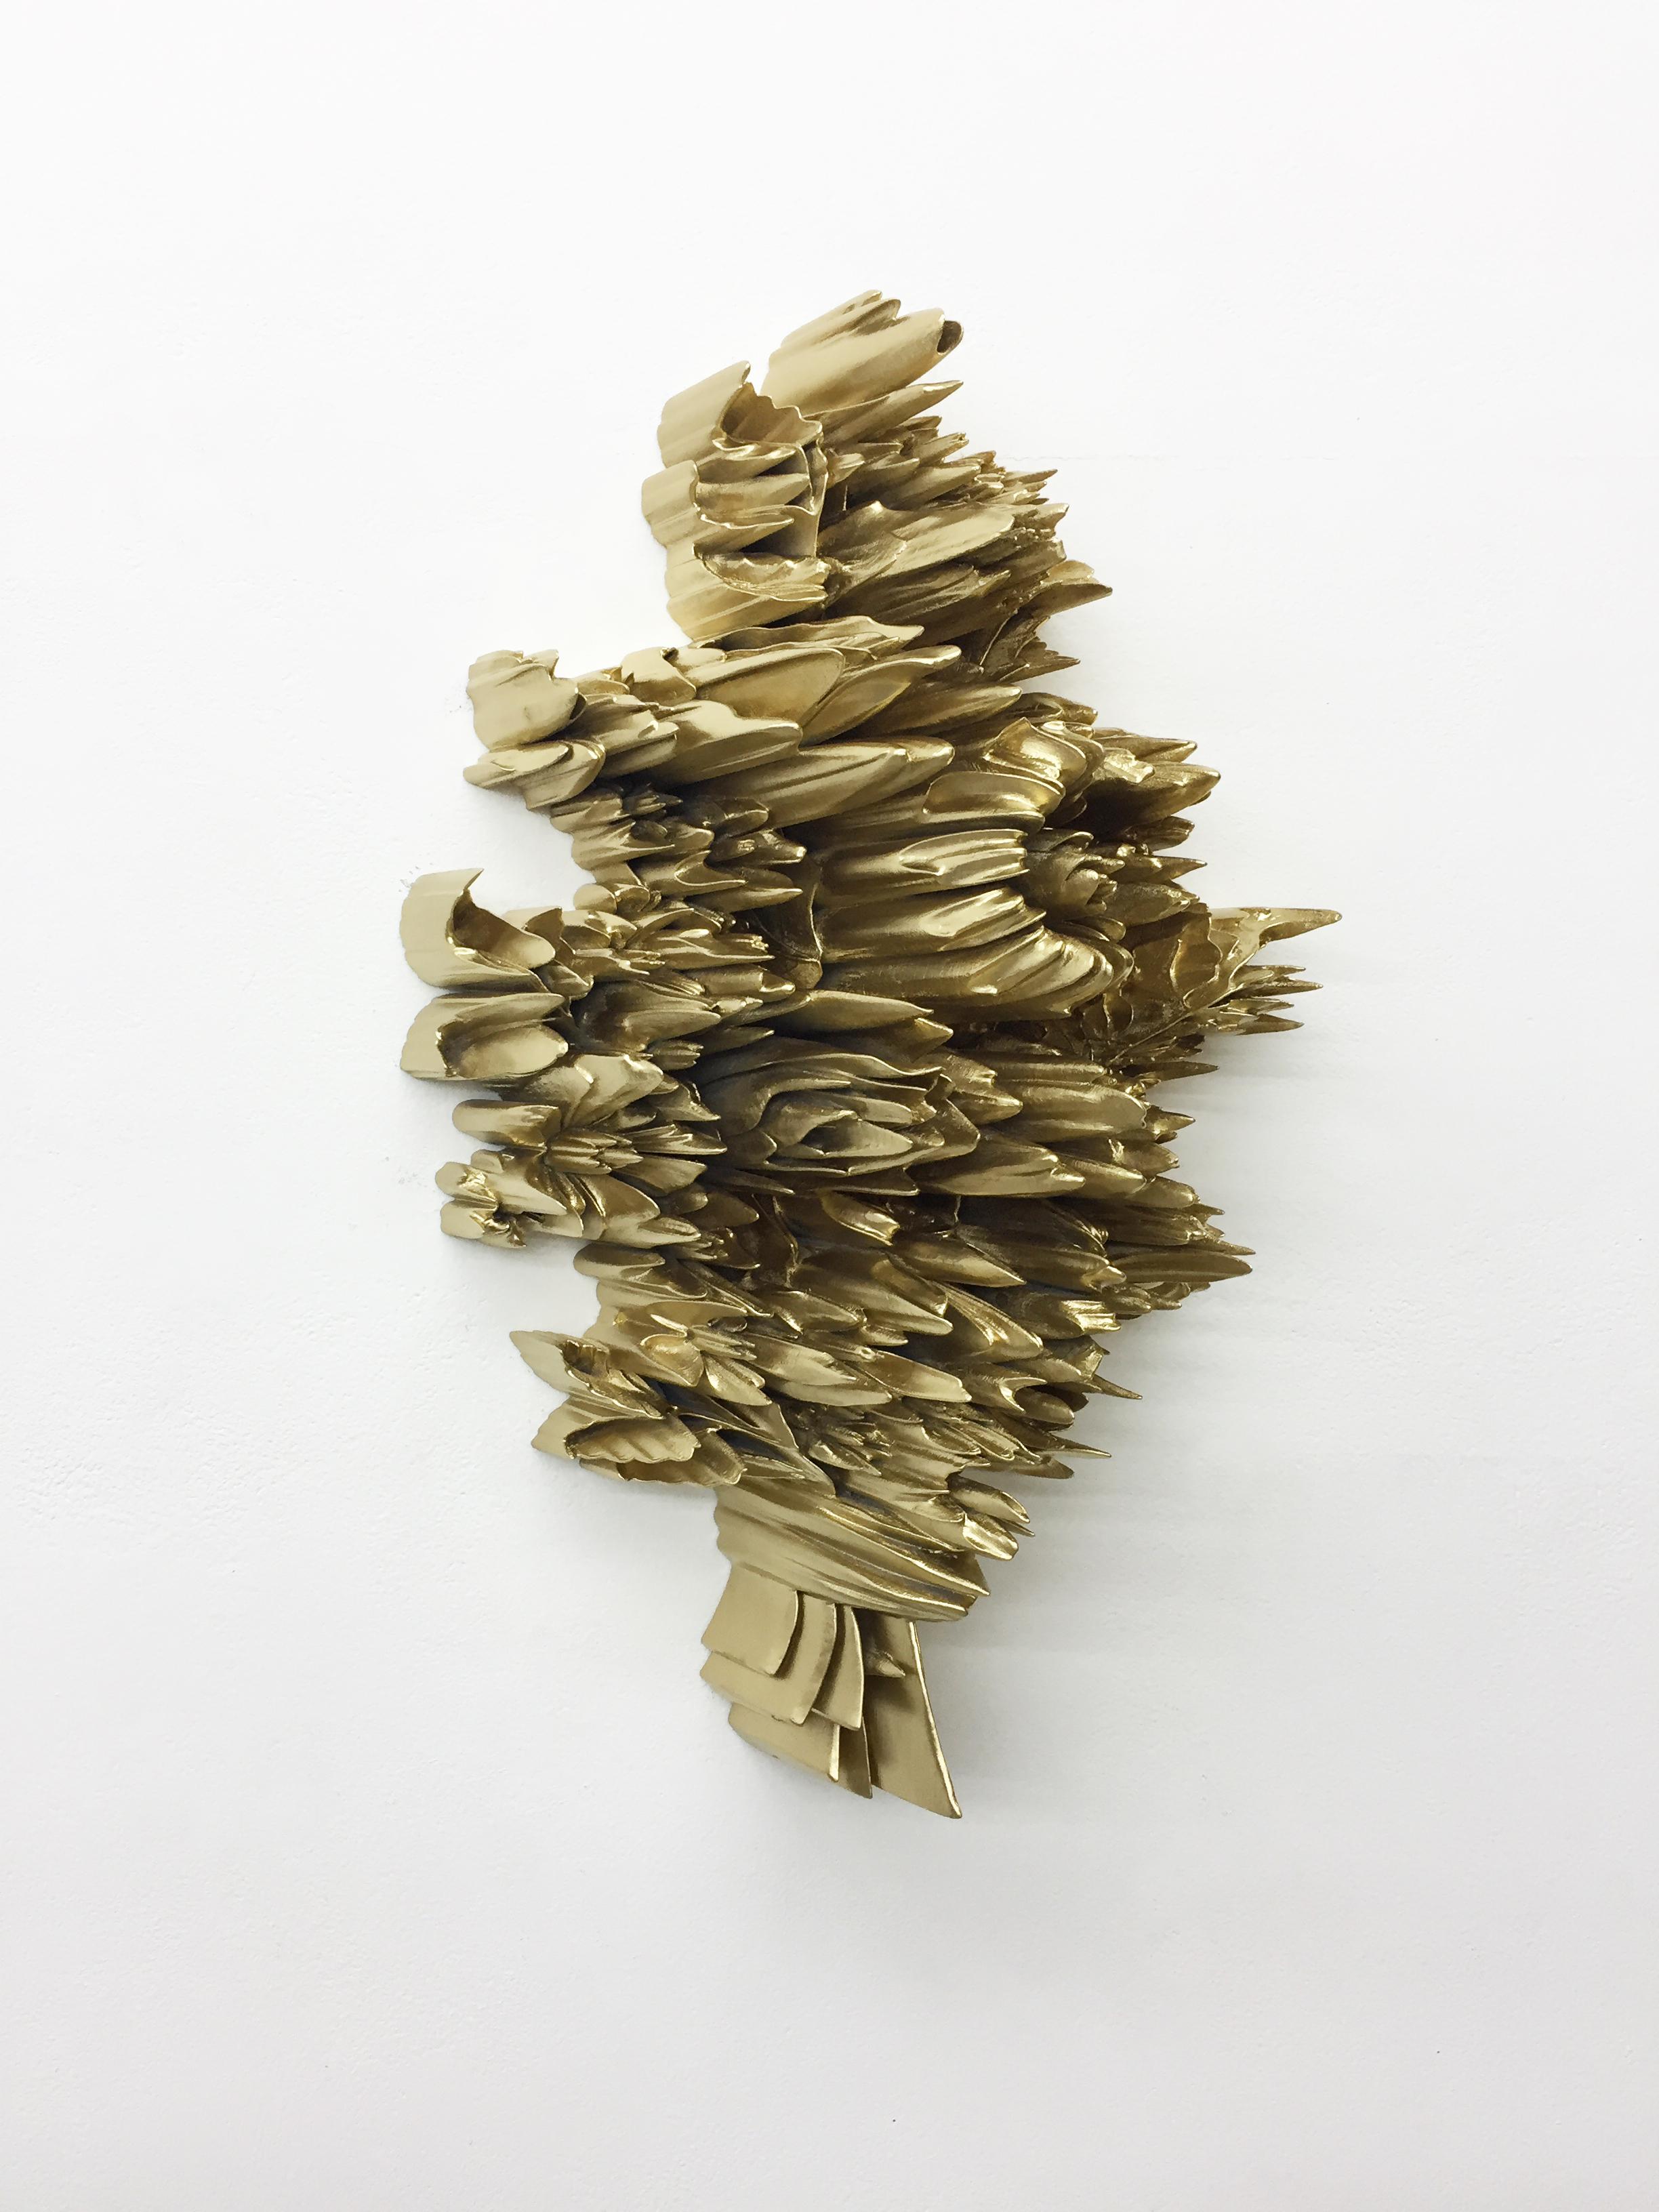 ROBERT LAZZARINI — SOCO Gallery